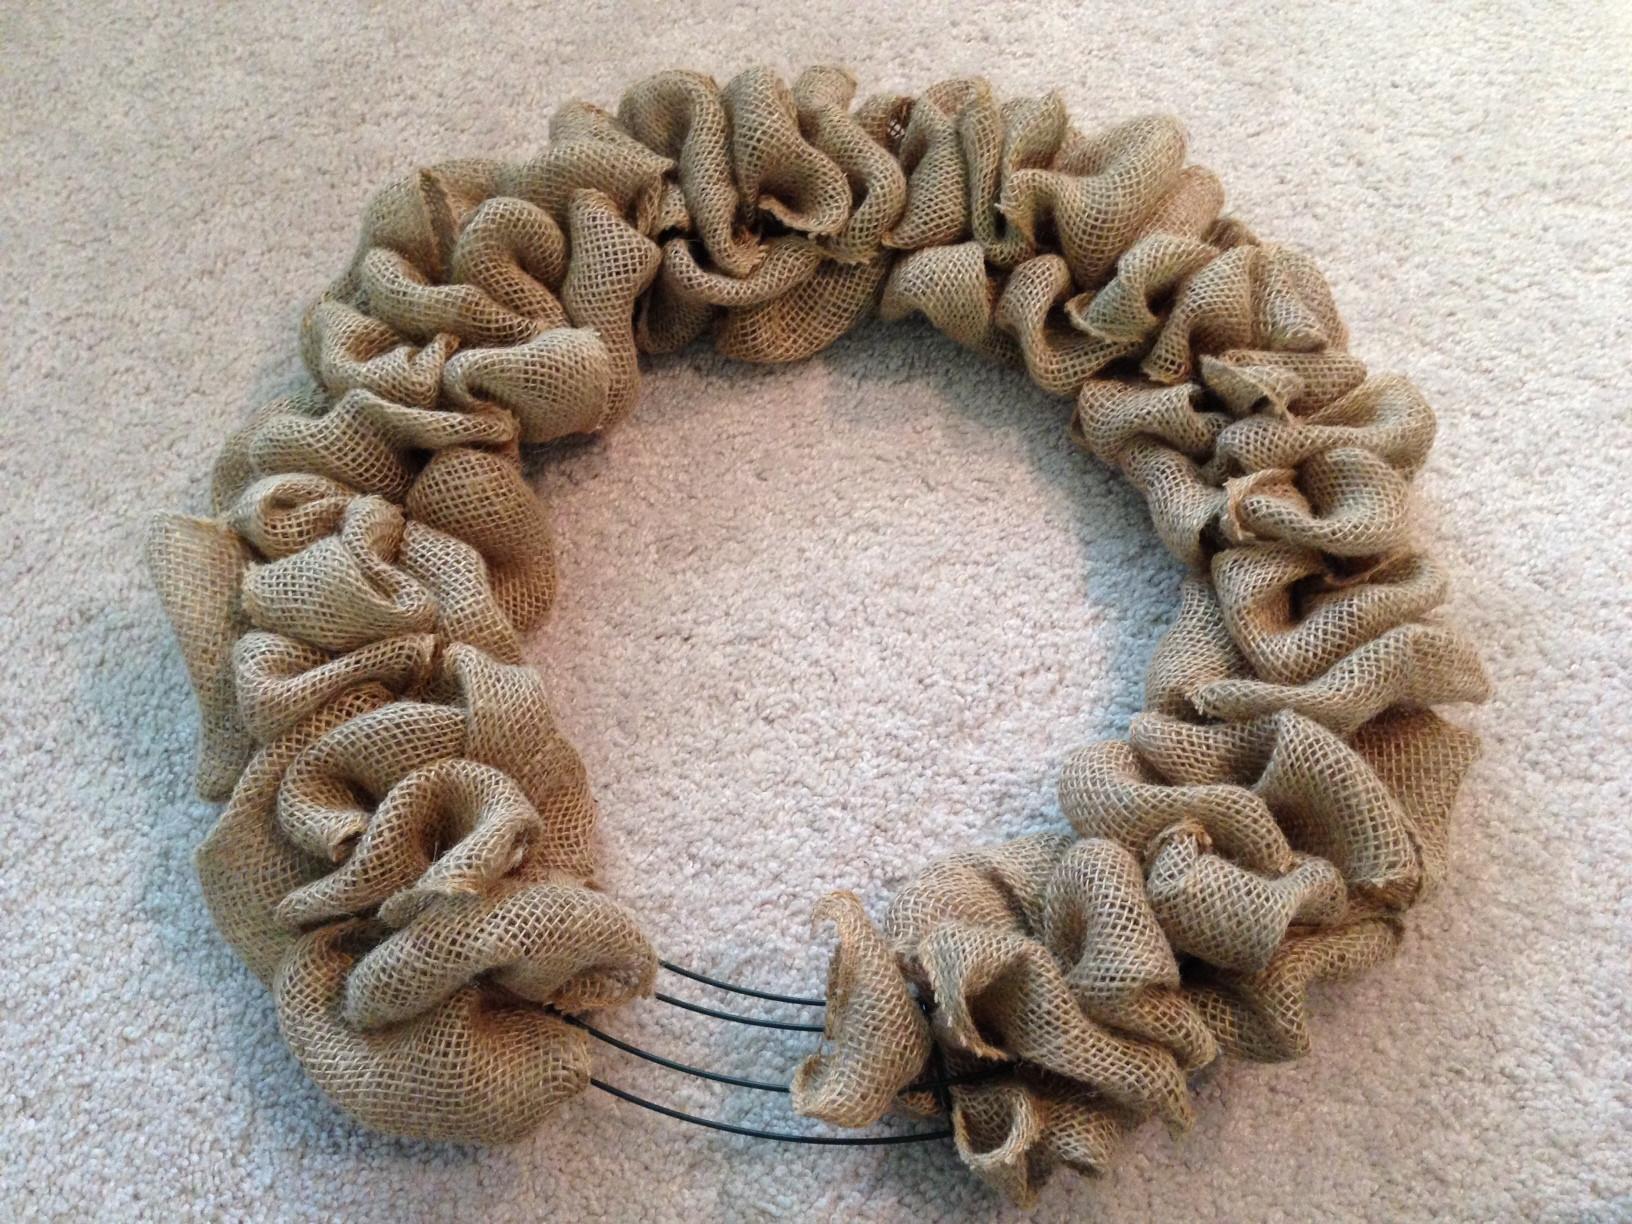 Best ideas about Burlap Wreath DIY . Save or Pin DIY Burlap Door Wreath Now.